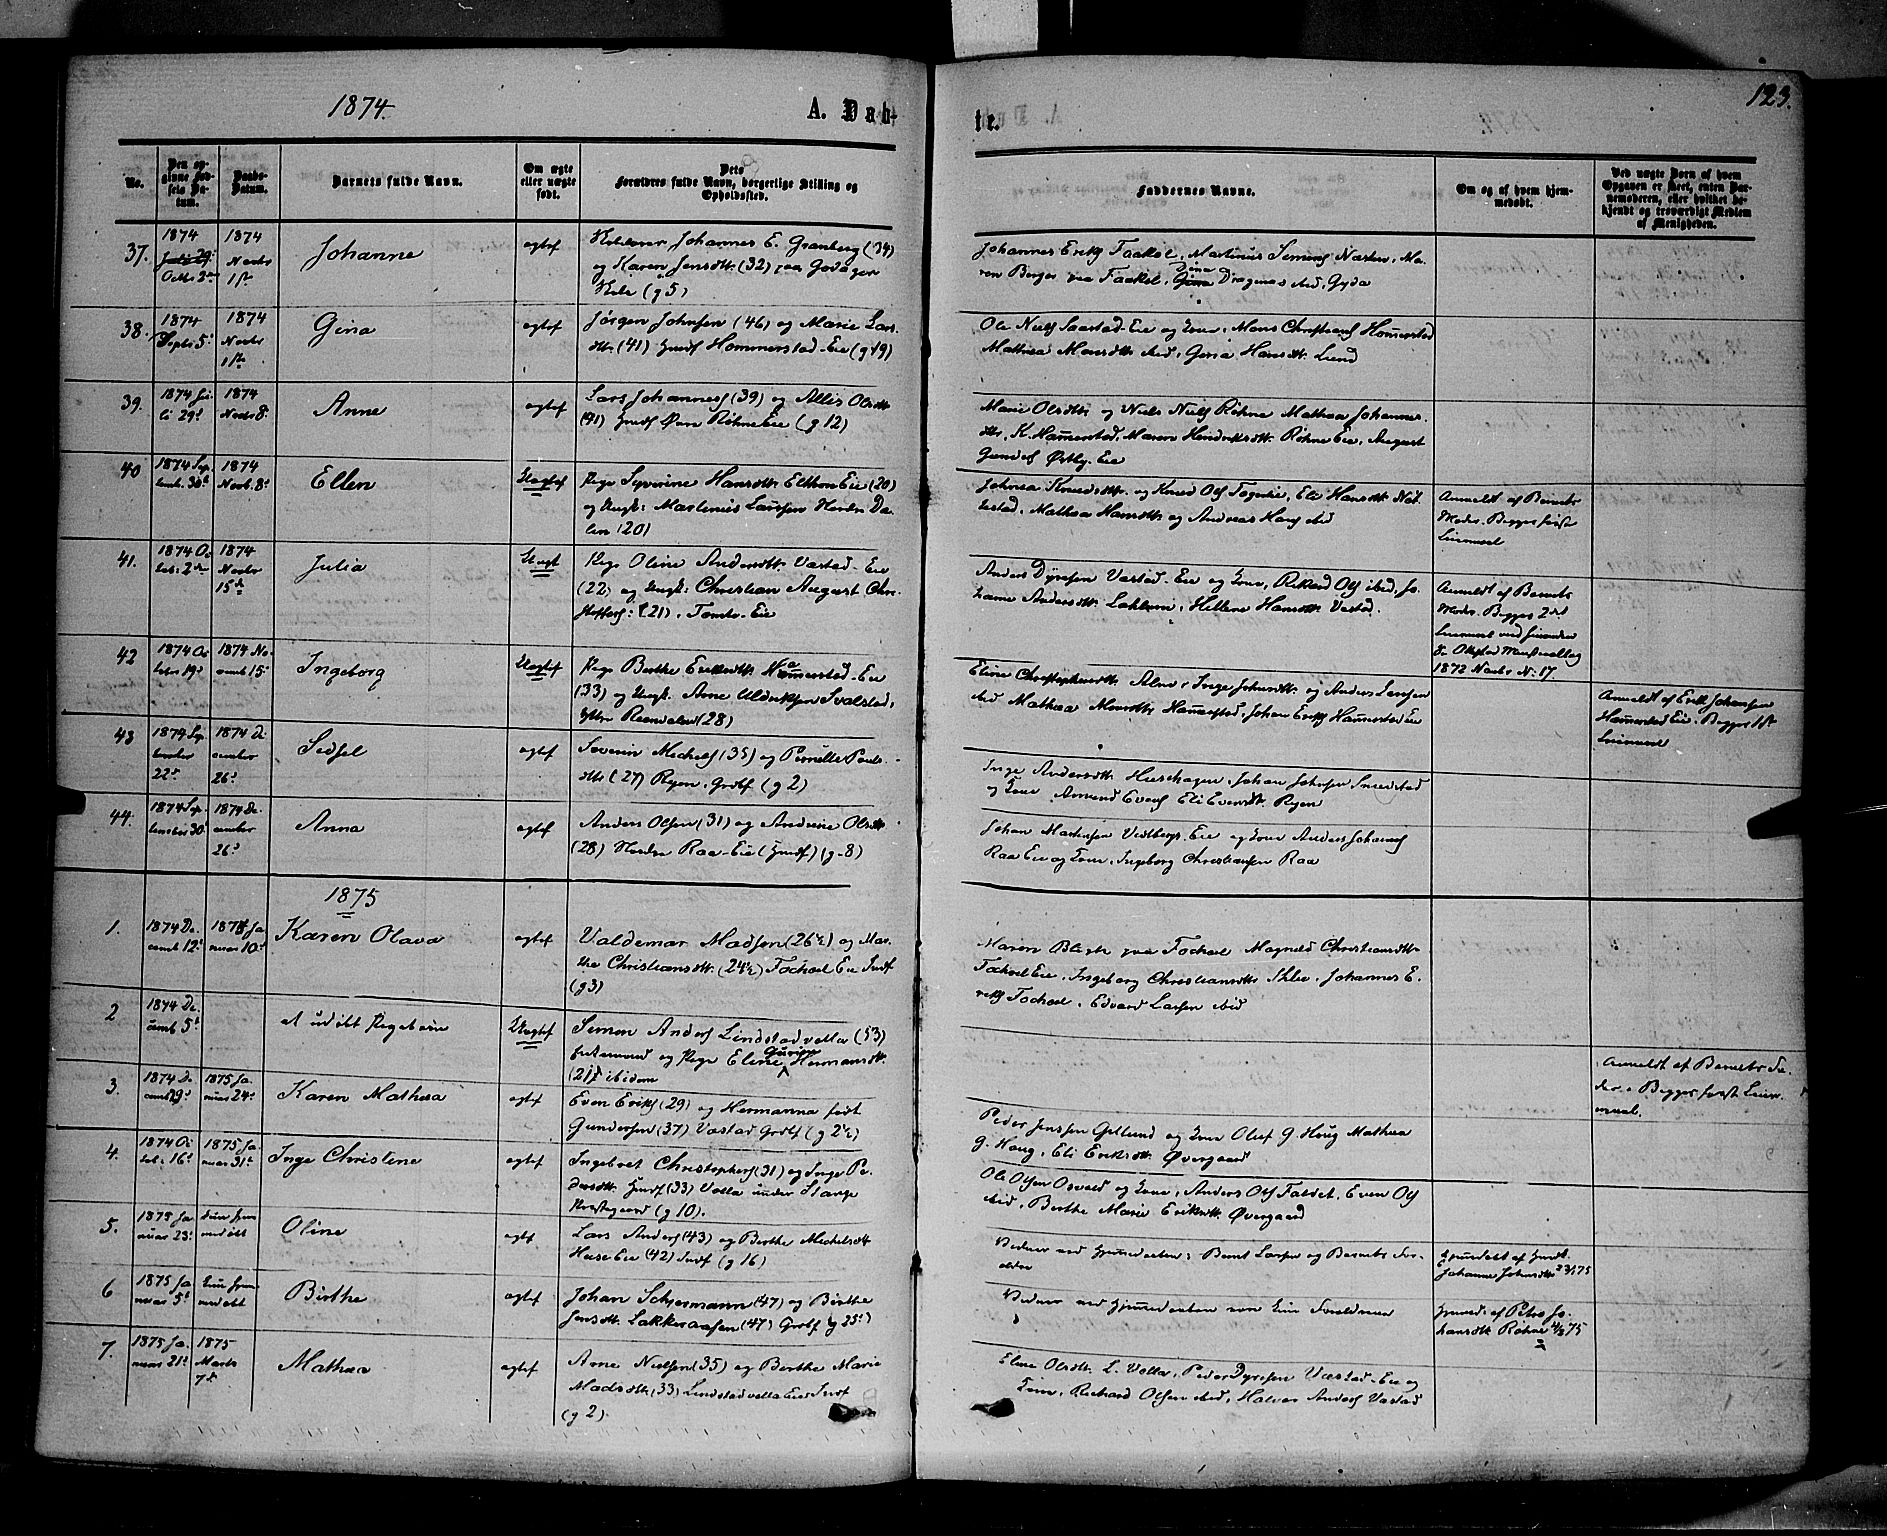 SAH, Stange prestekontor, K/L0013: Ministerialbok nr. 13, 1862-1879, s. 123